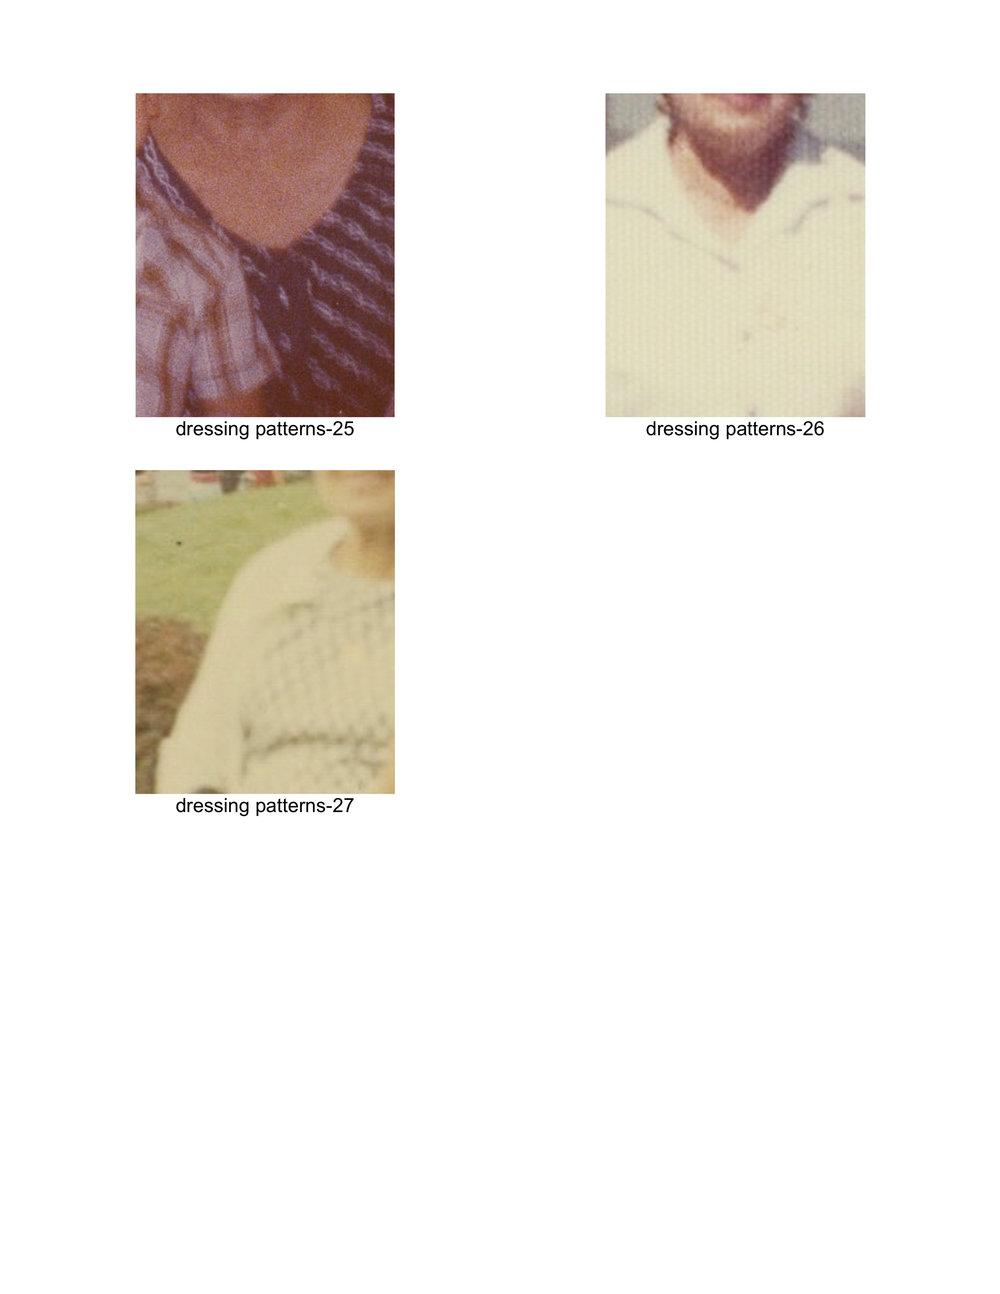 dressing patern SHEETS-5.jpg